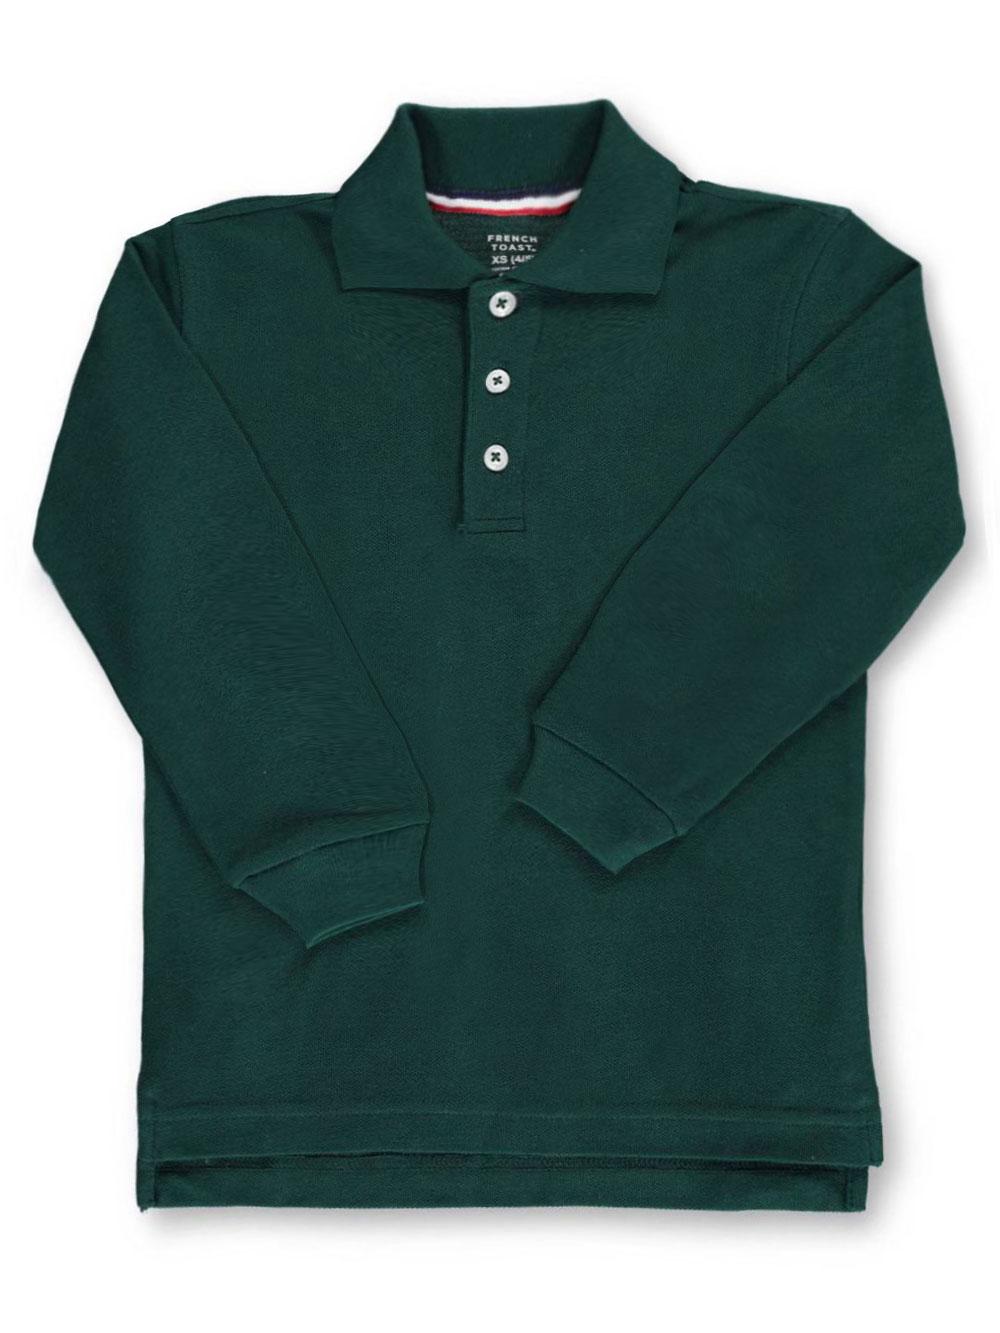 French Toast School Uniform Unisex L/S Pique Polo (Sizes 4 - 7) - green, 7